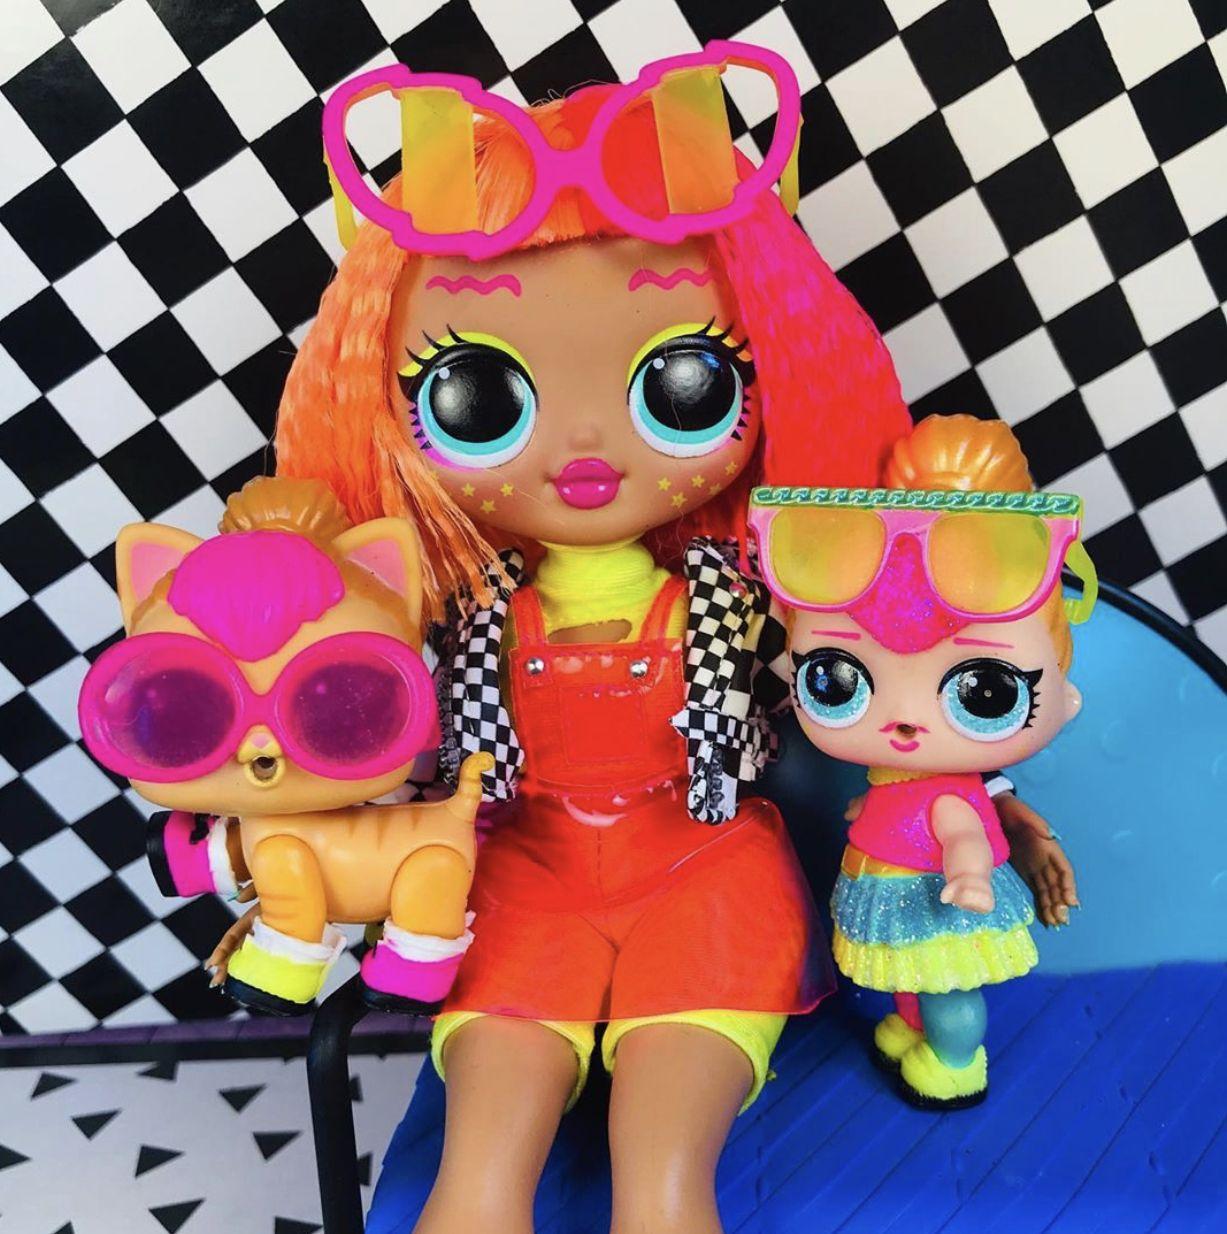 #LOLSurprise #LOLOMG #L.O.L.O.M.G. | Куклы, Барби, Ремесла